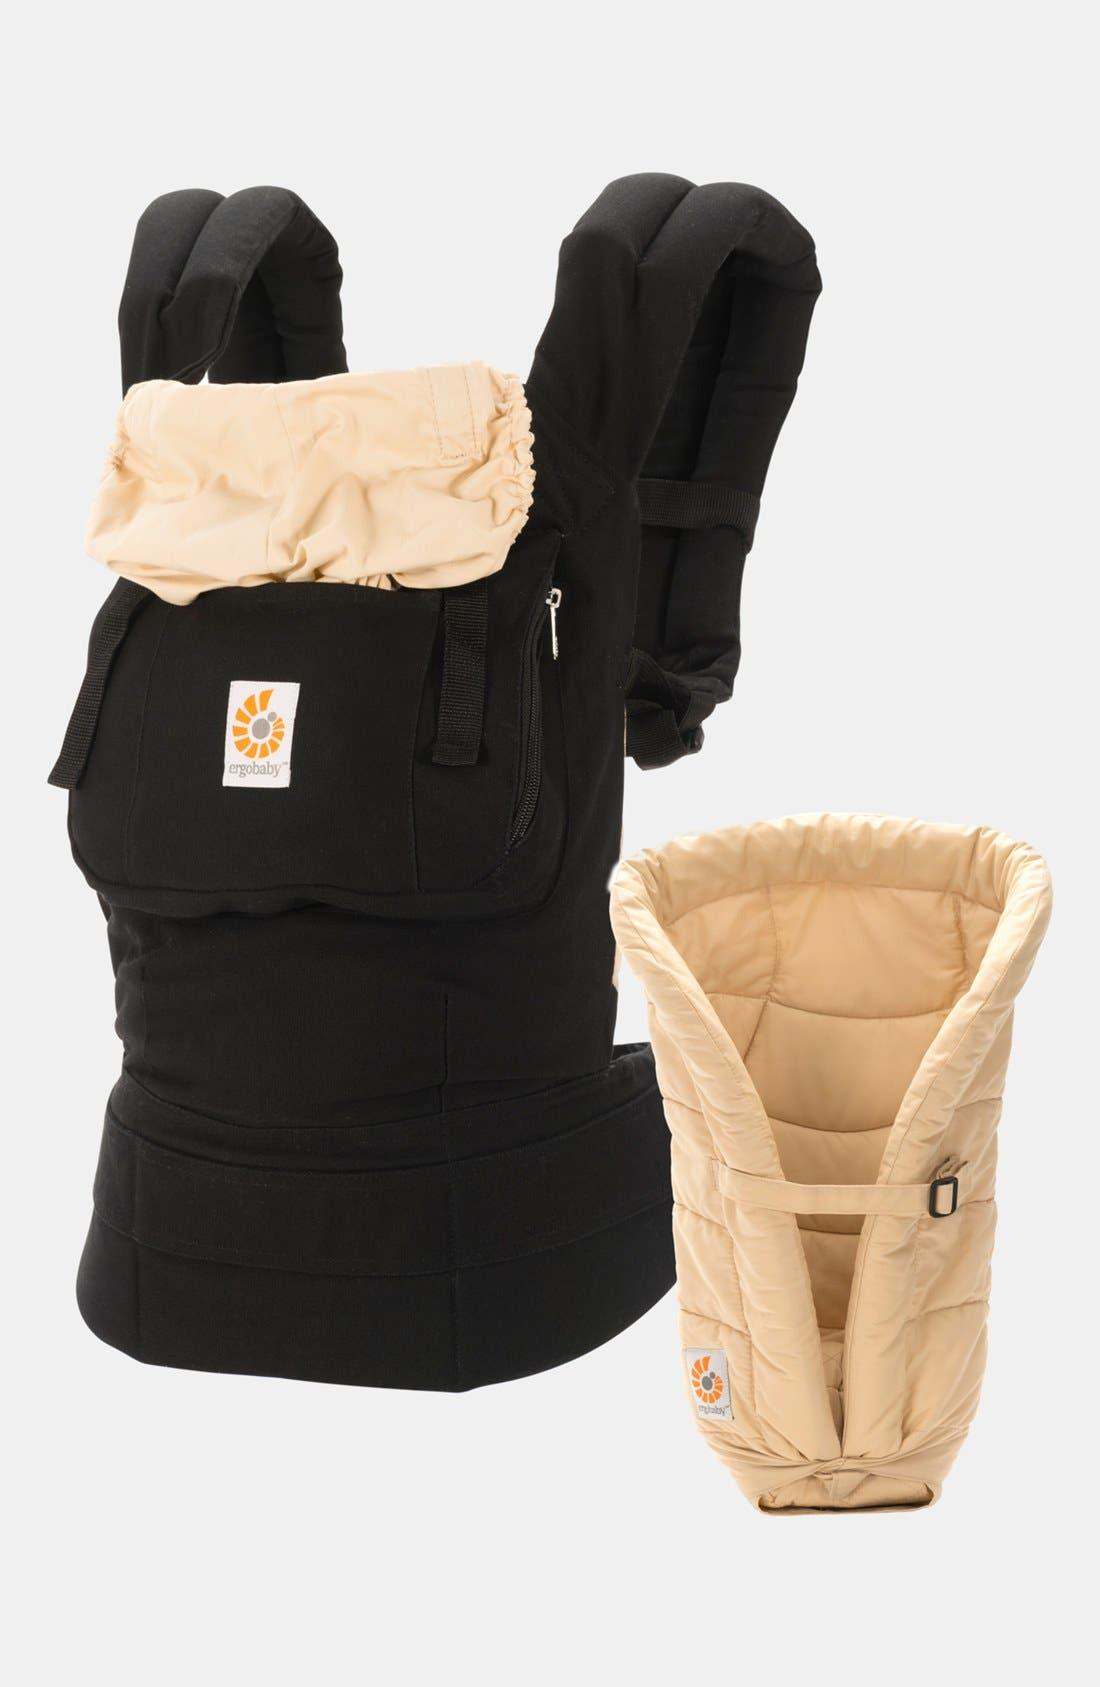 Alternate Image 1 Selected - ERGObaby 'Bundle of Joy' Baby Carrier